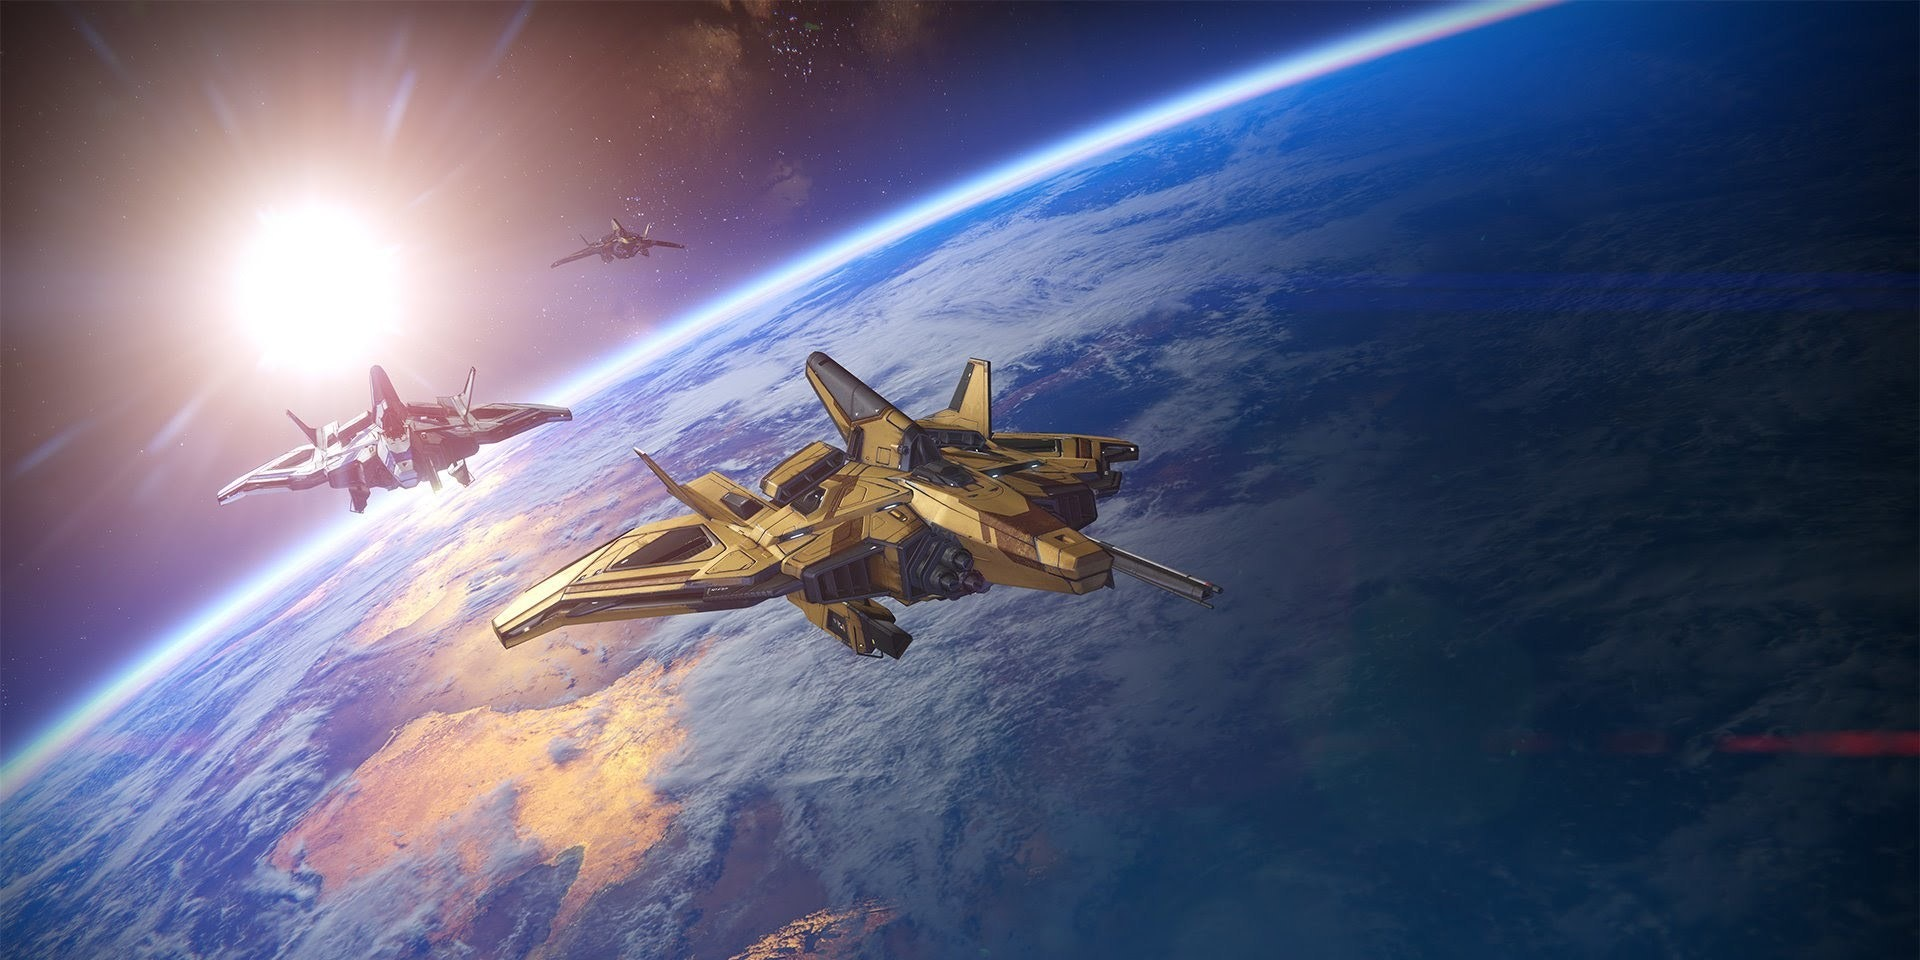 4 Conspiracy Theories About Alien Tech